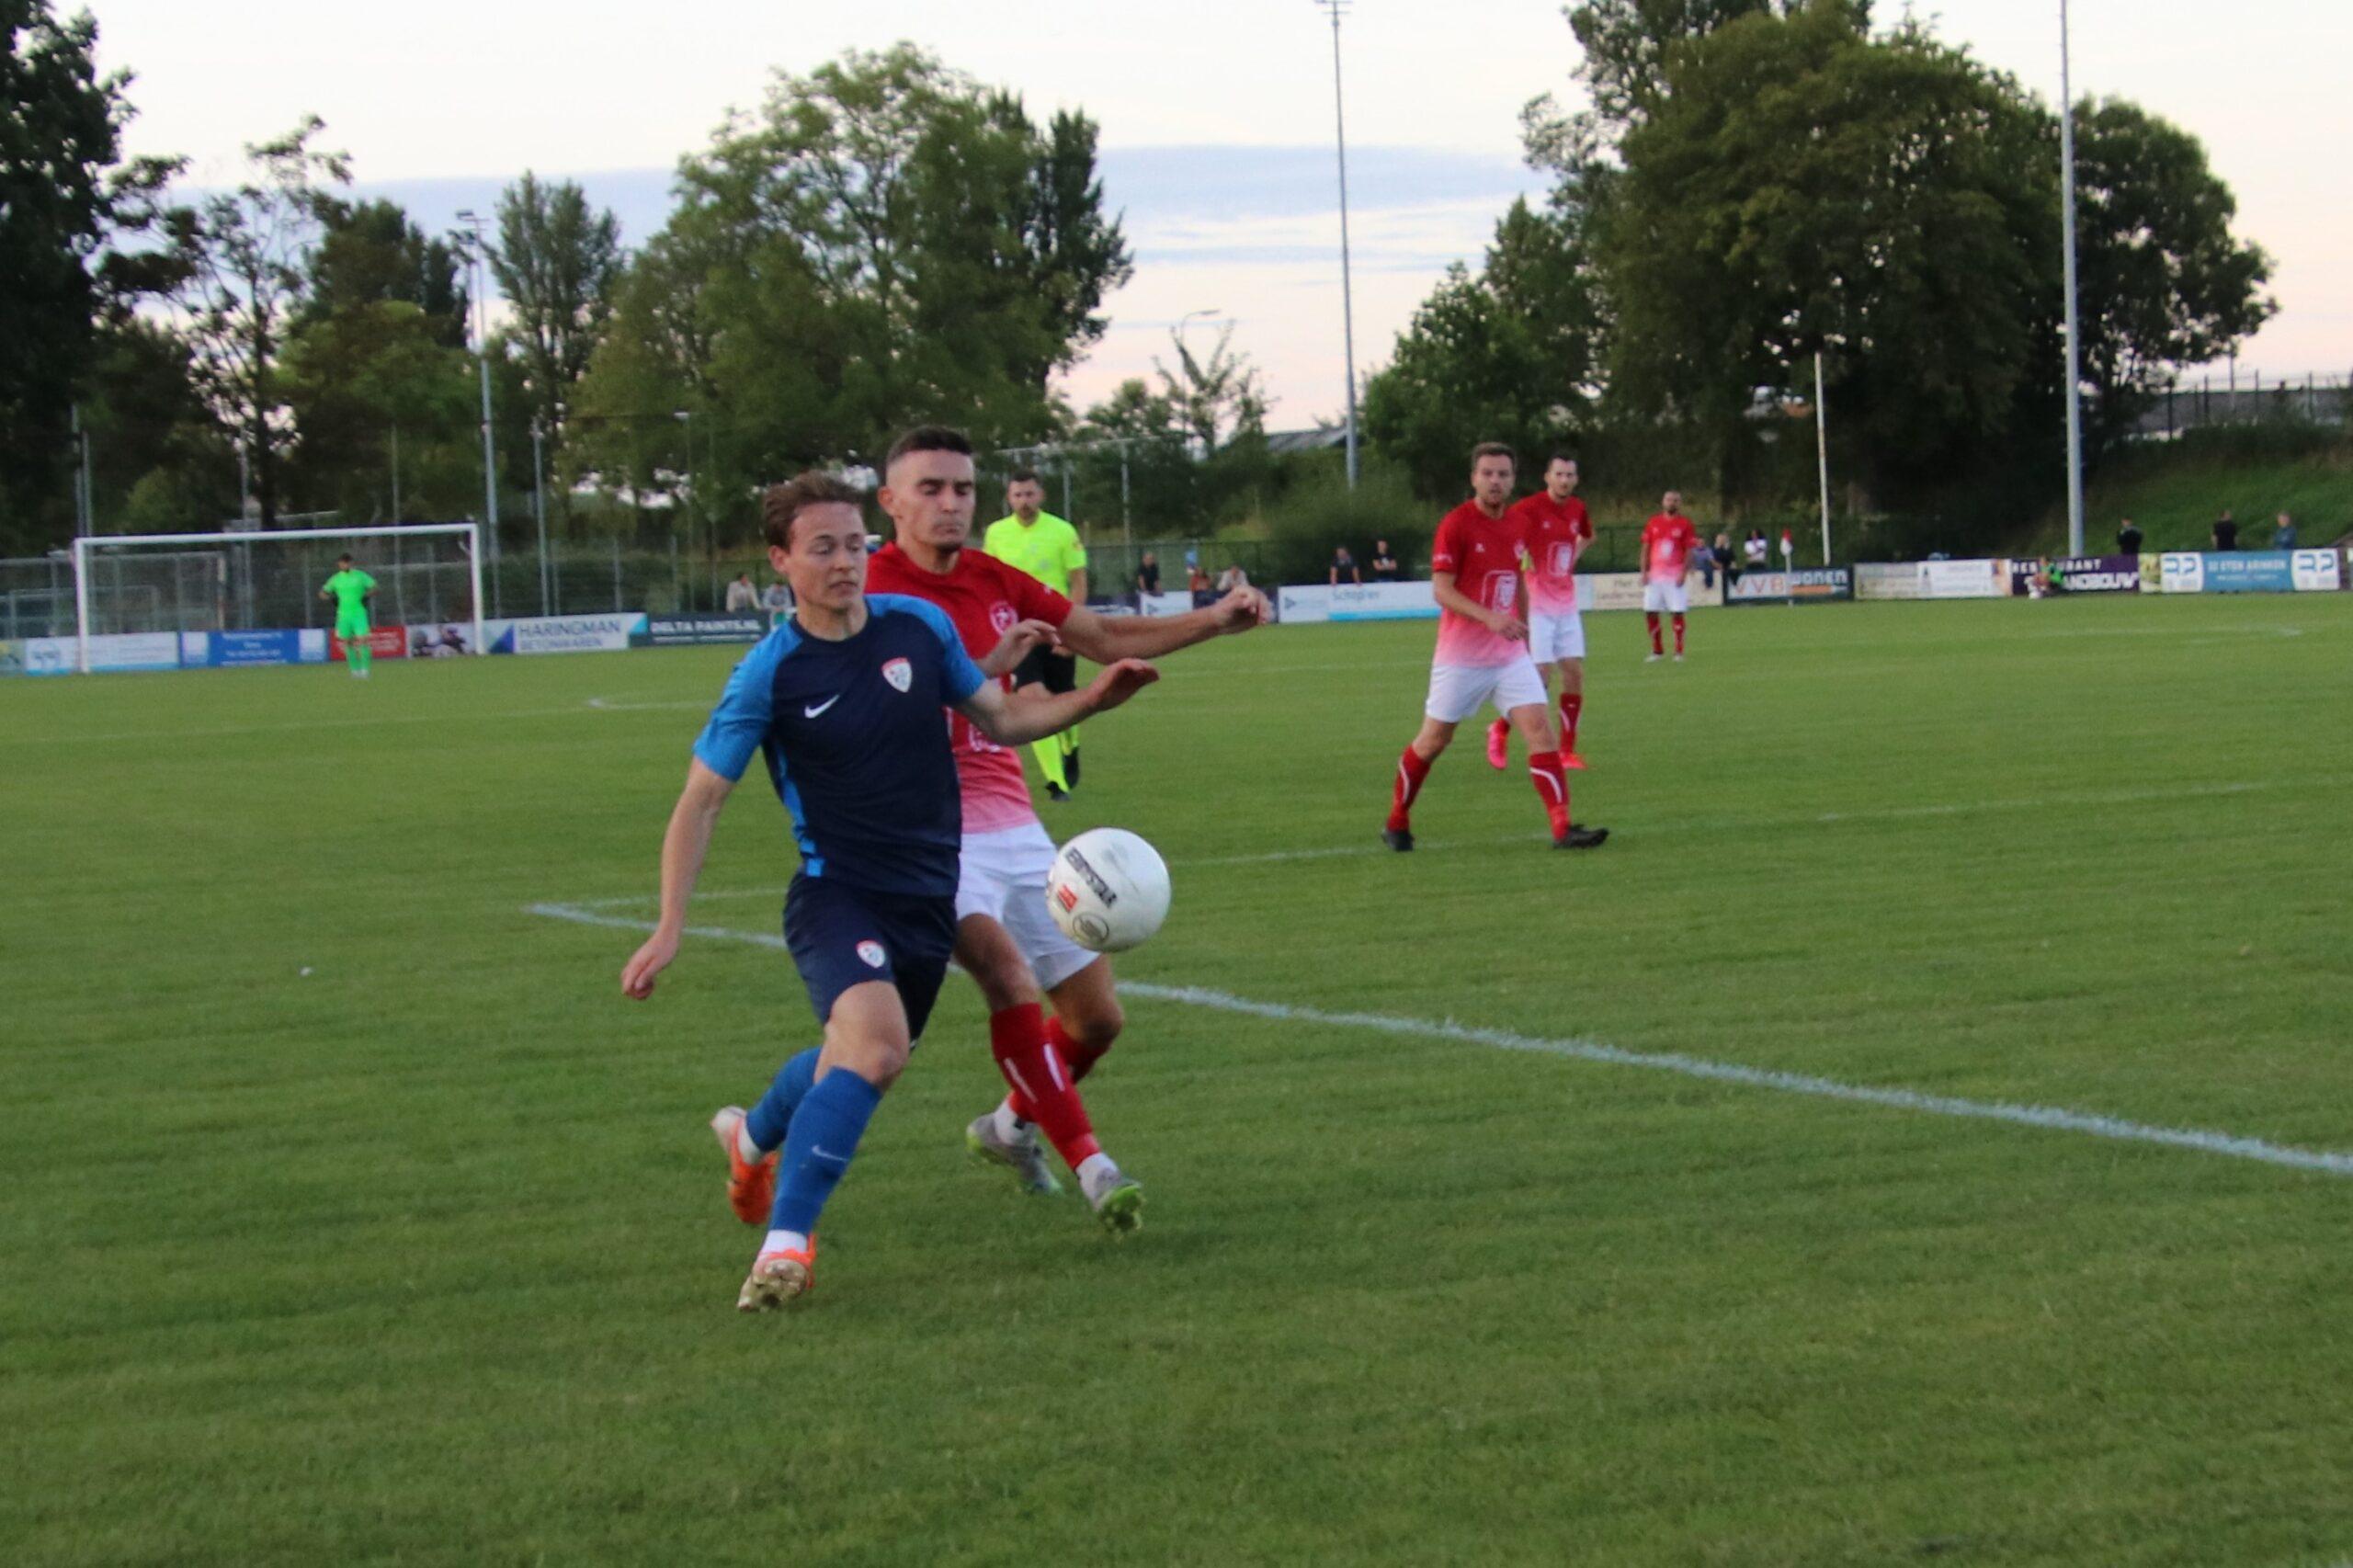 Wessel Meiring - Sportlust - Goes